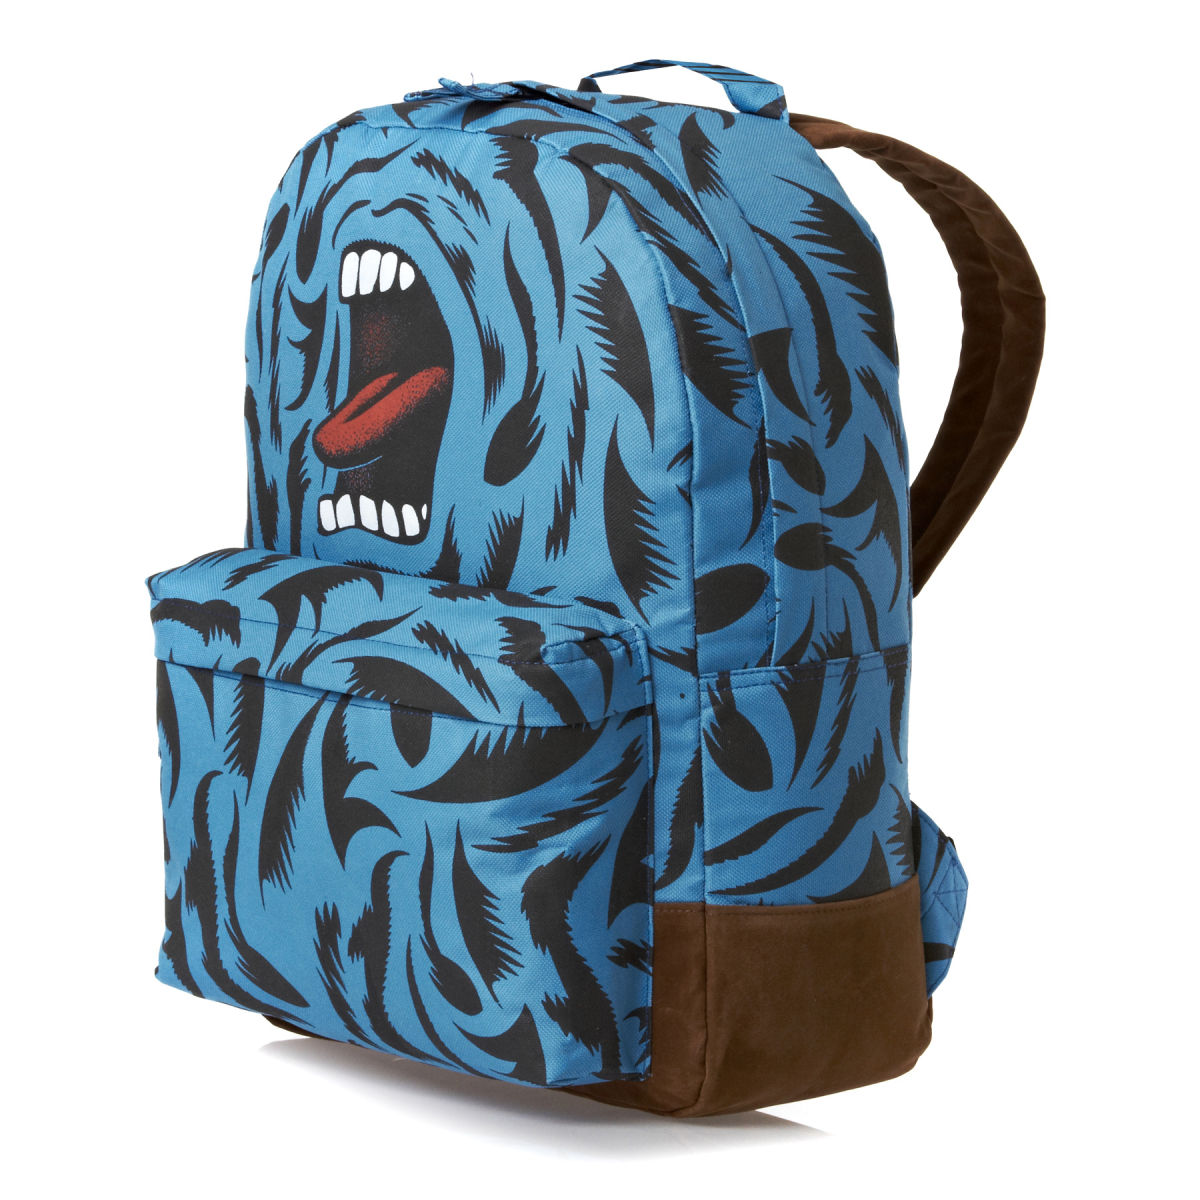 Santa Cruz Big Mouth Backpack